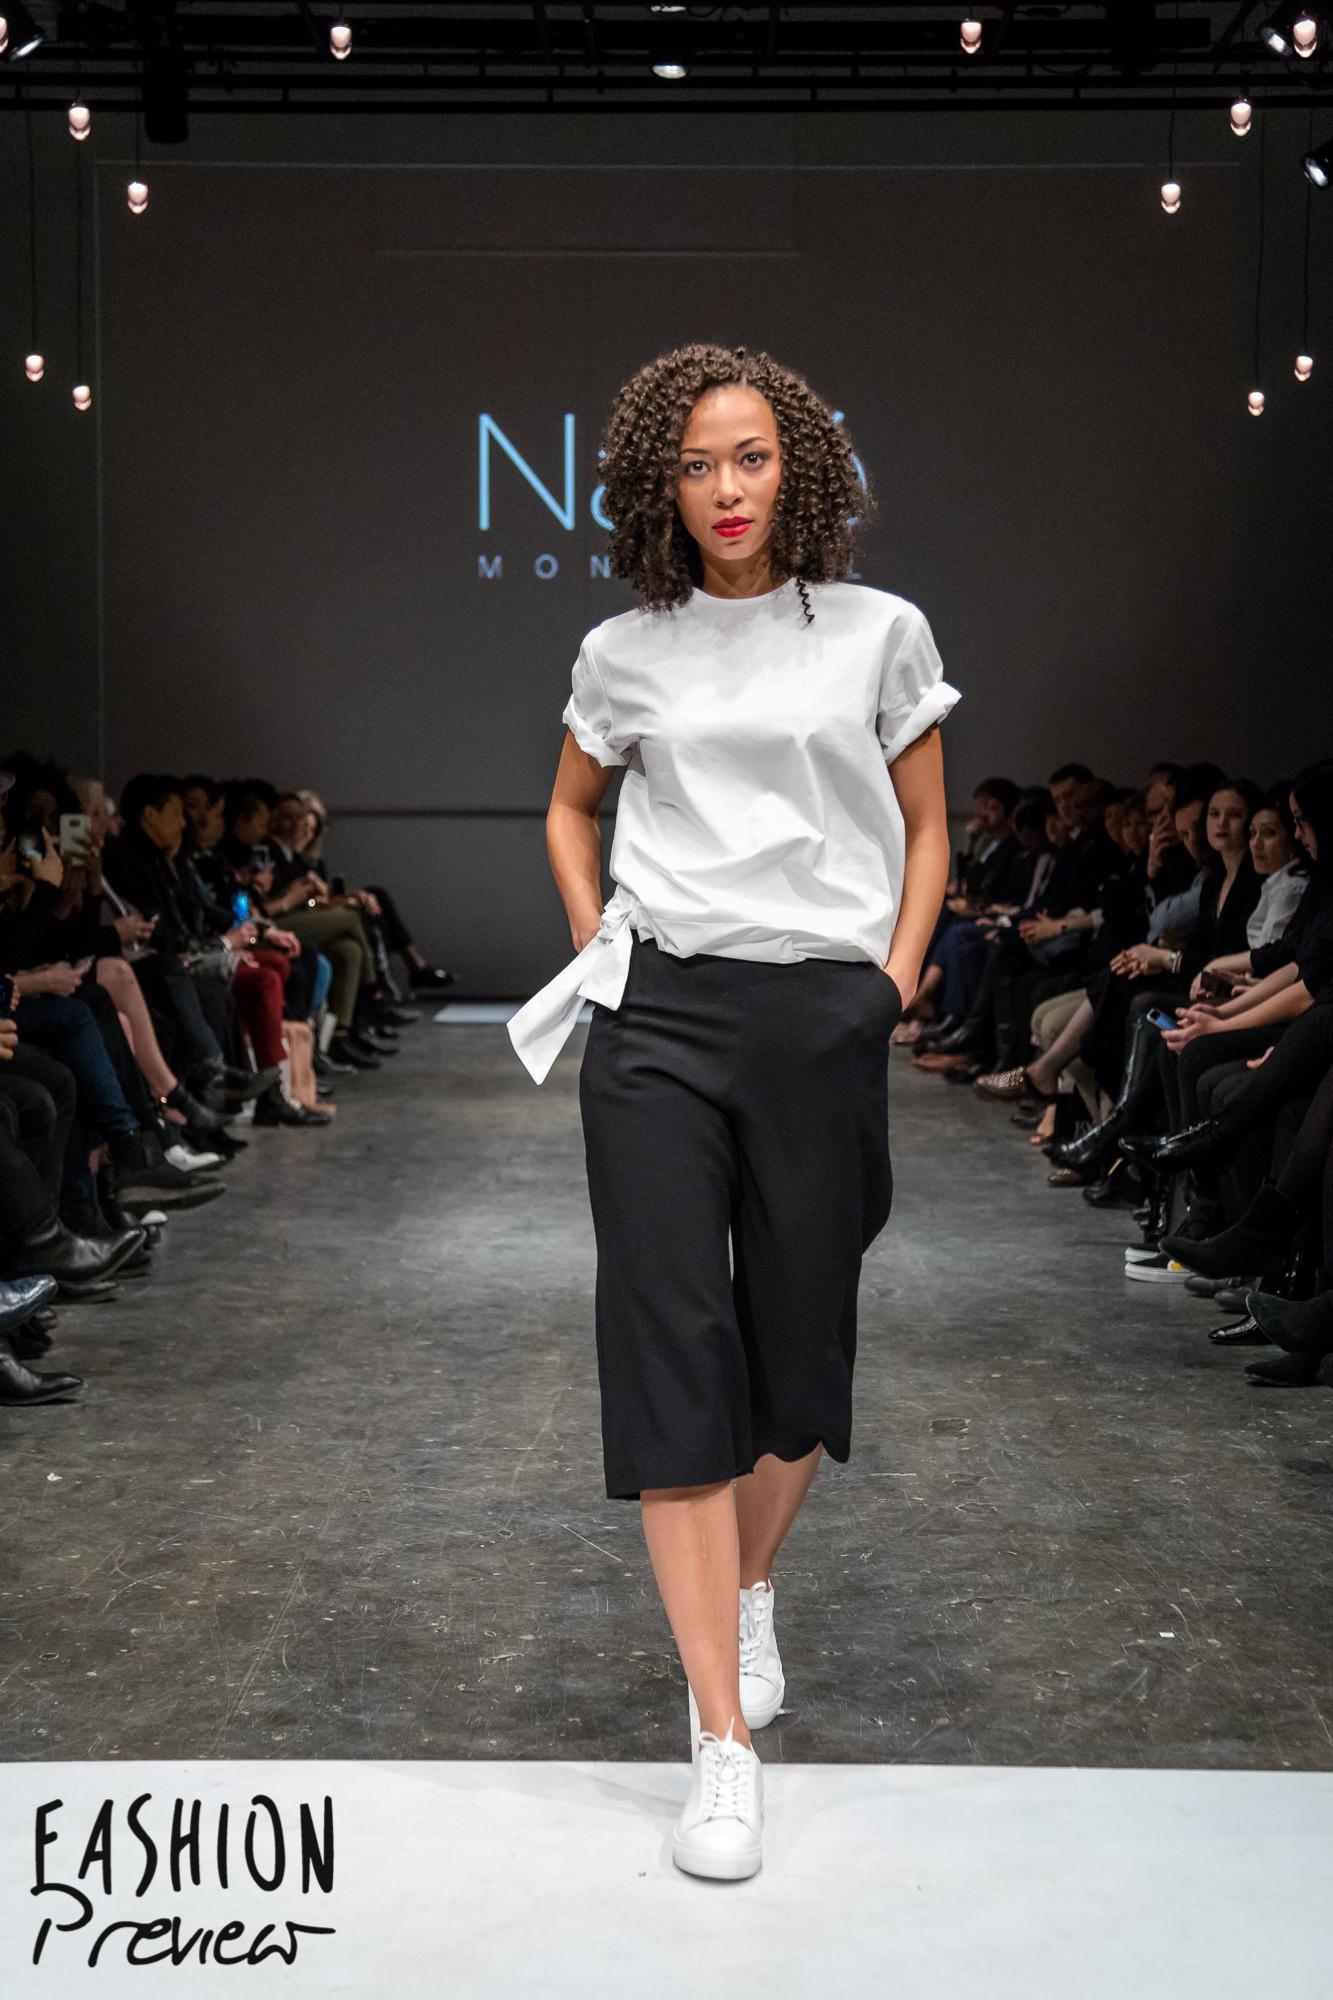 Fashion Preview 9 - Naike-01.jpg